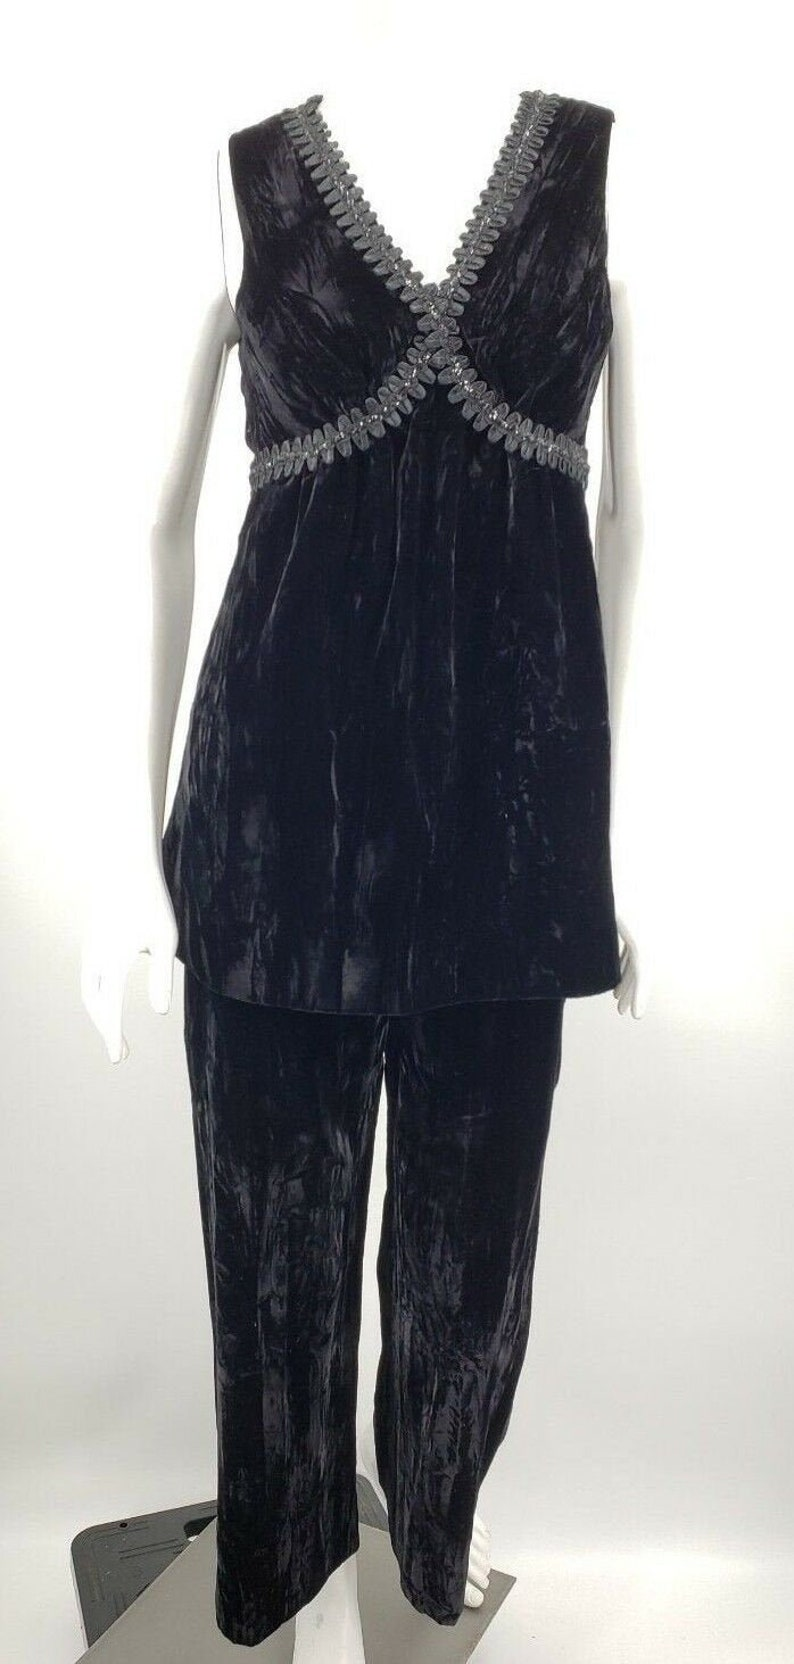 Vintage Peck /& Peck Fifth Avenue New York Tunic Top High Waist Pants Black Velvet